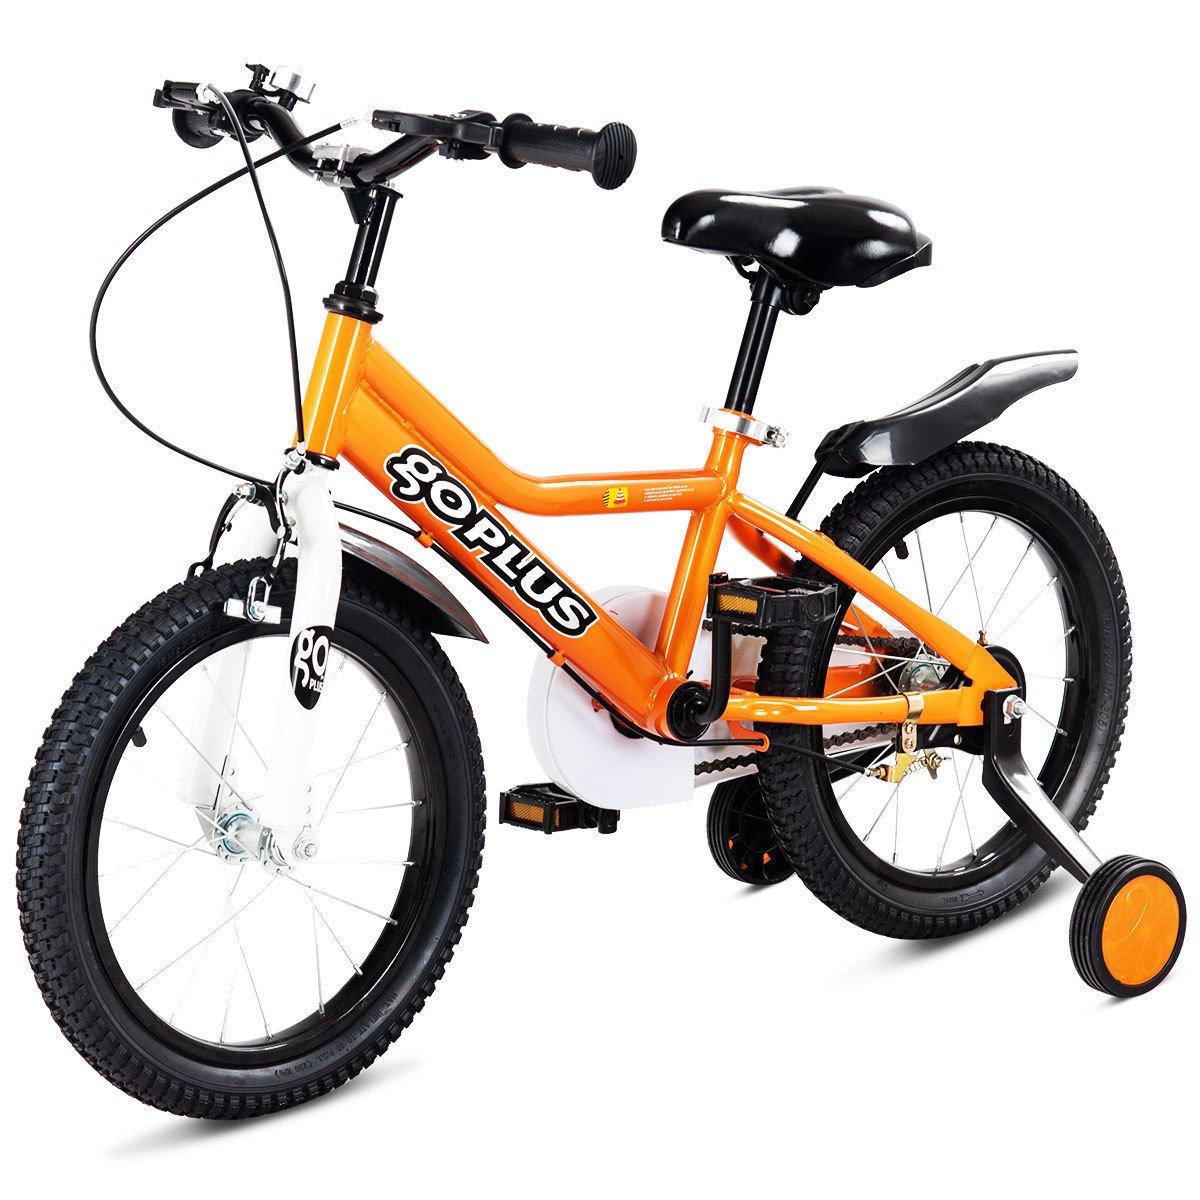 Goplus 12'' Kid's Bike Freestyle Outdoor Sports Bicycle with Training Wheels Boys Girls Cycling (Orange)